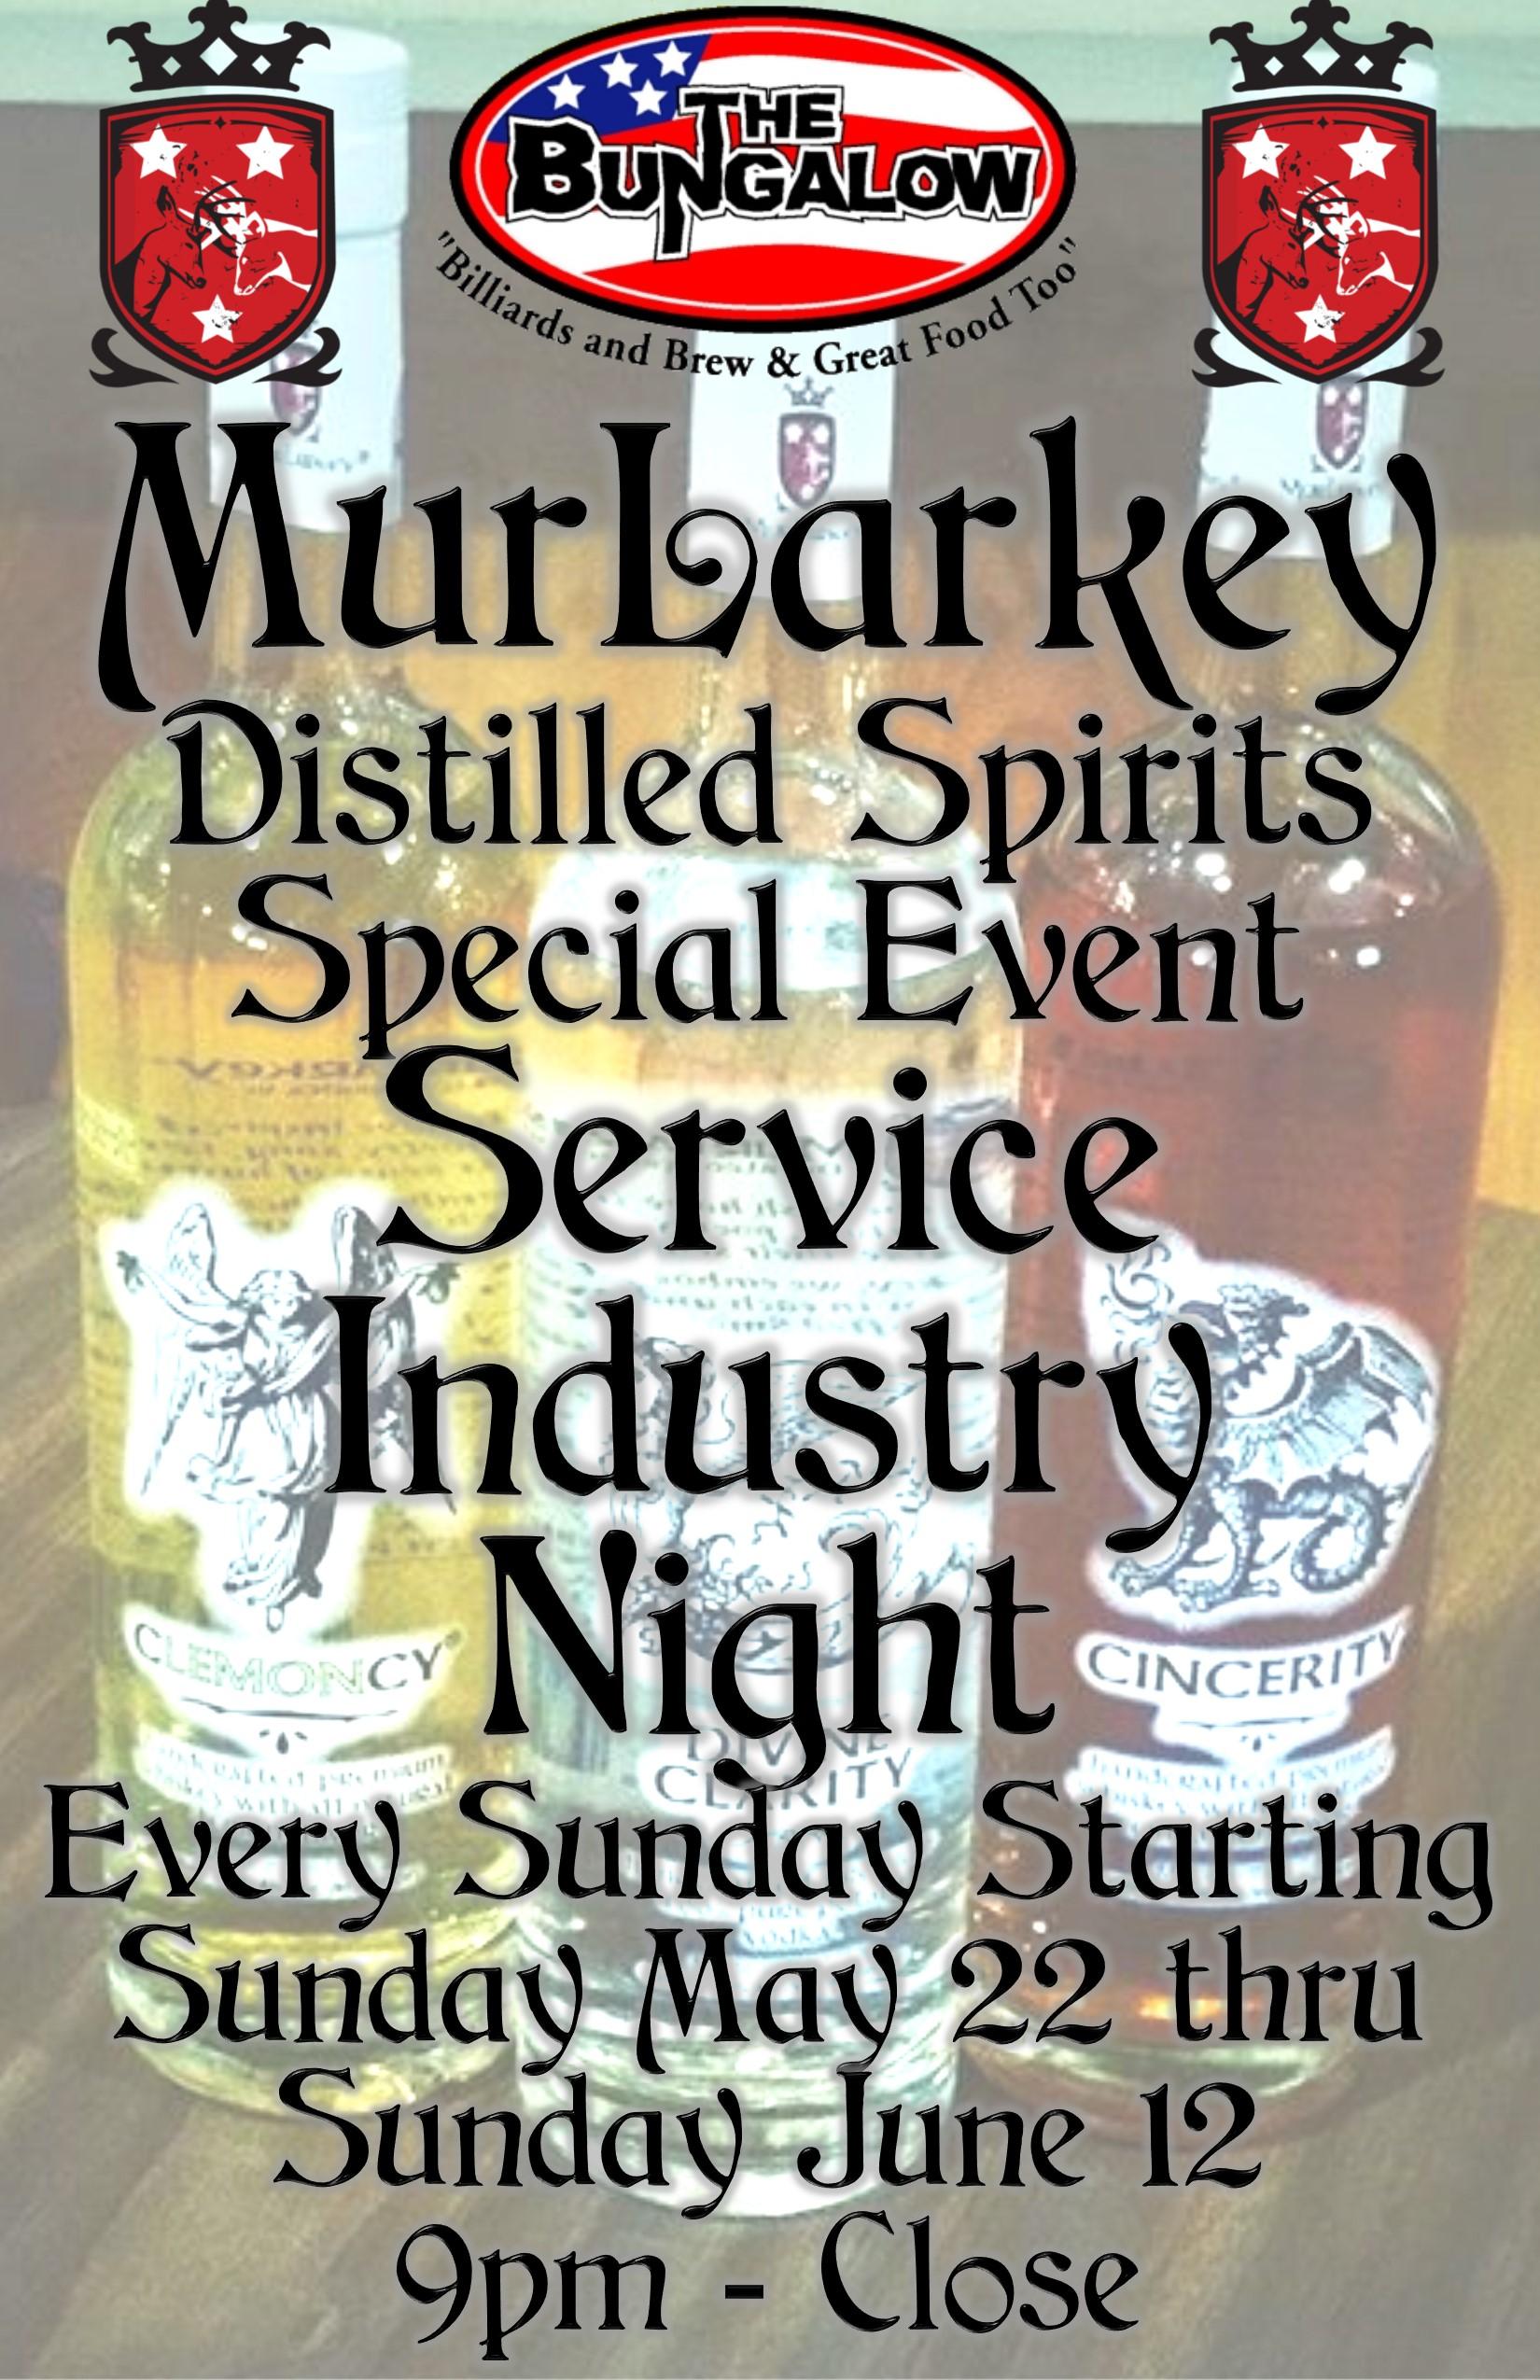 murlarkey Event